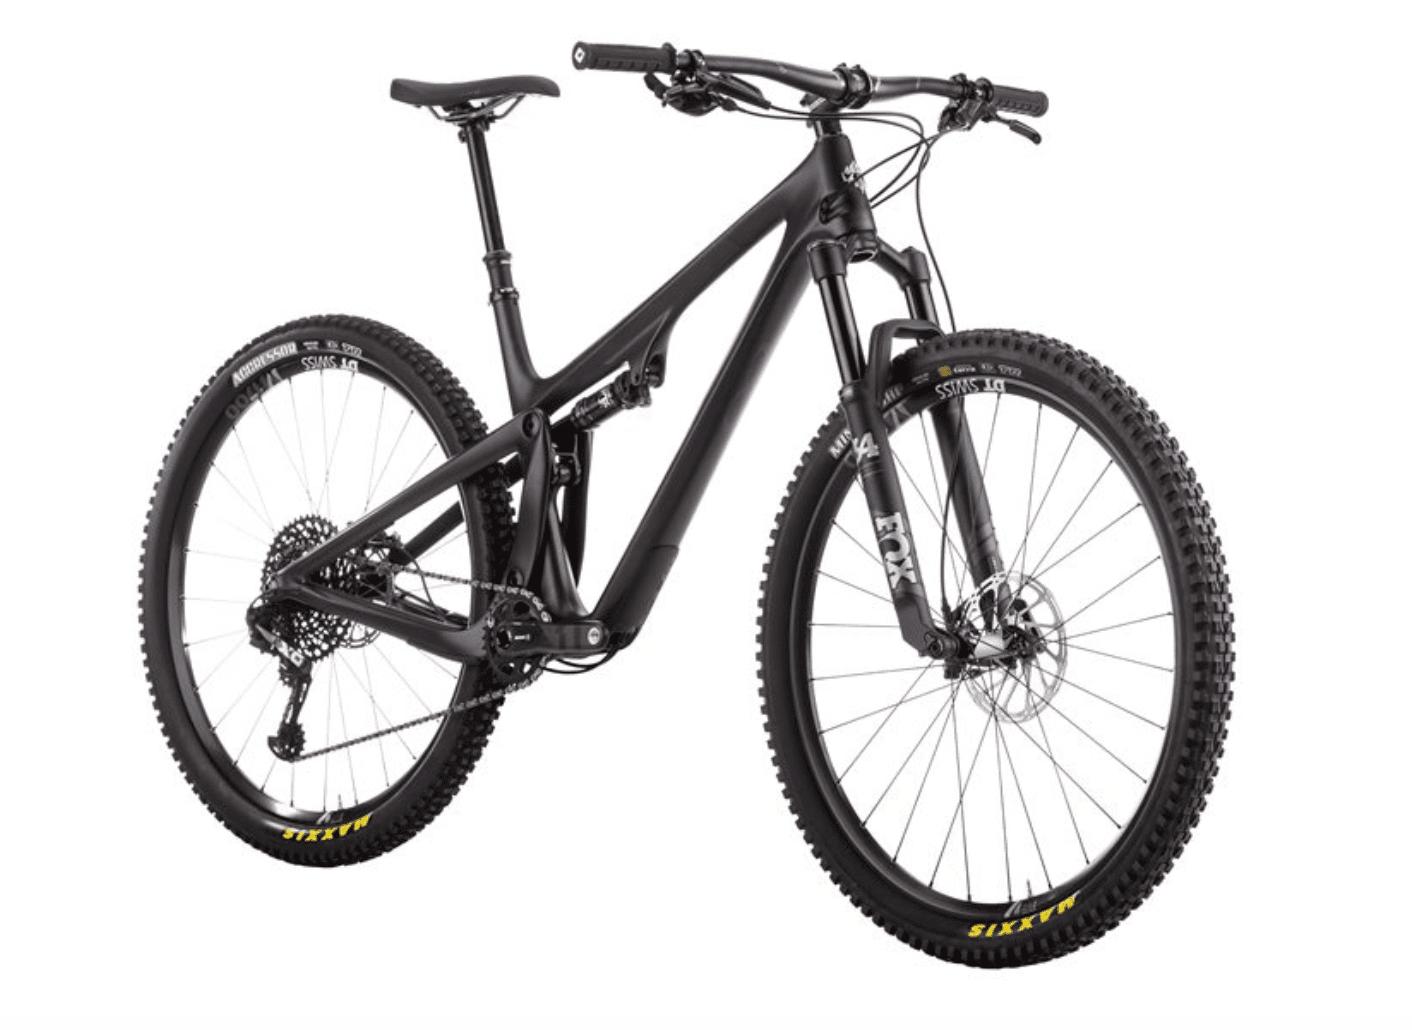 Yeti SB100 Carbon C2 Bike